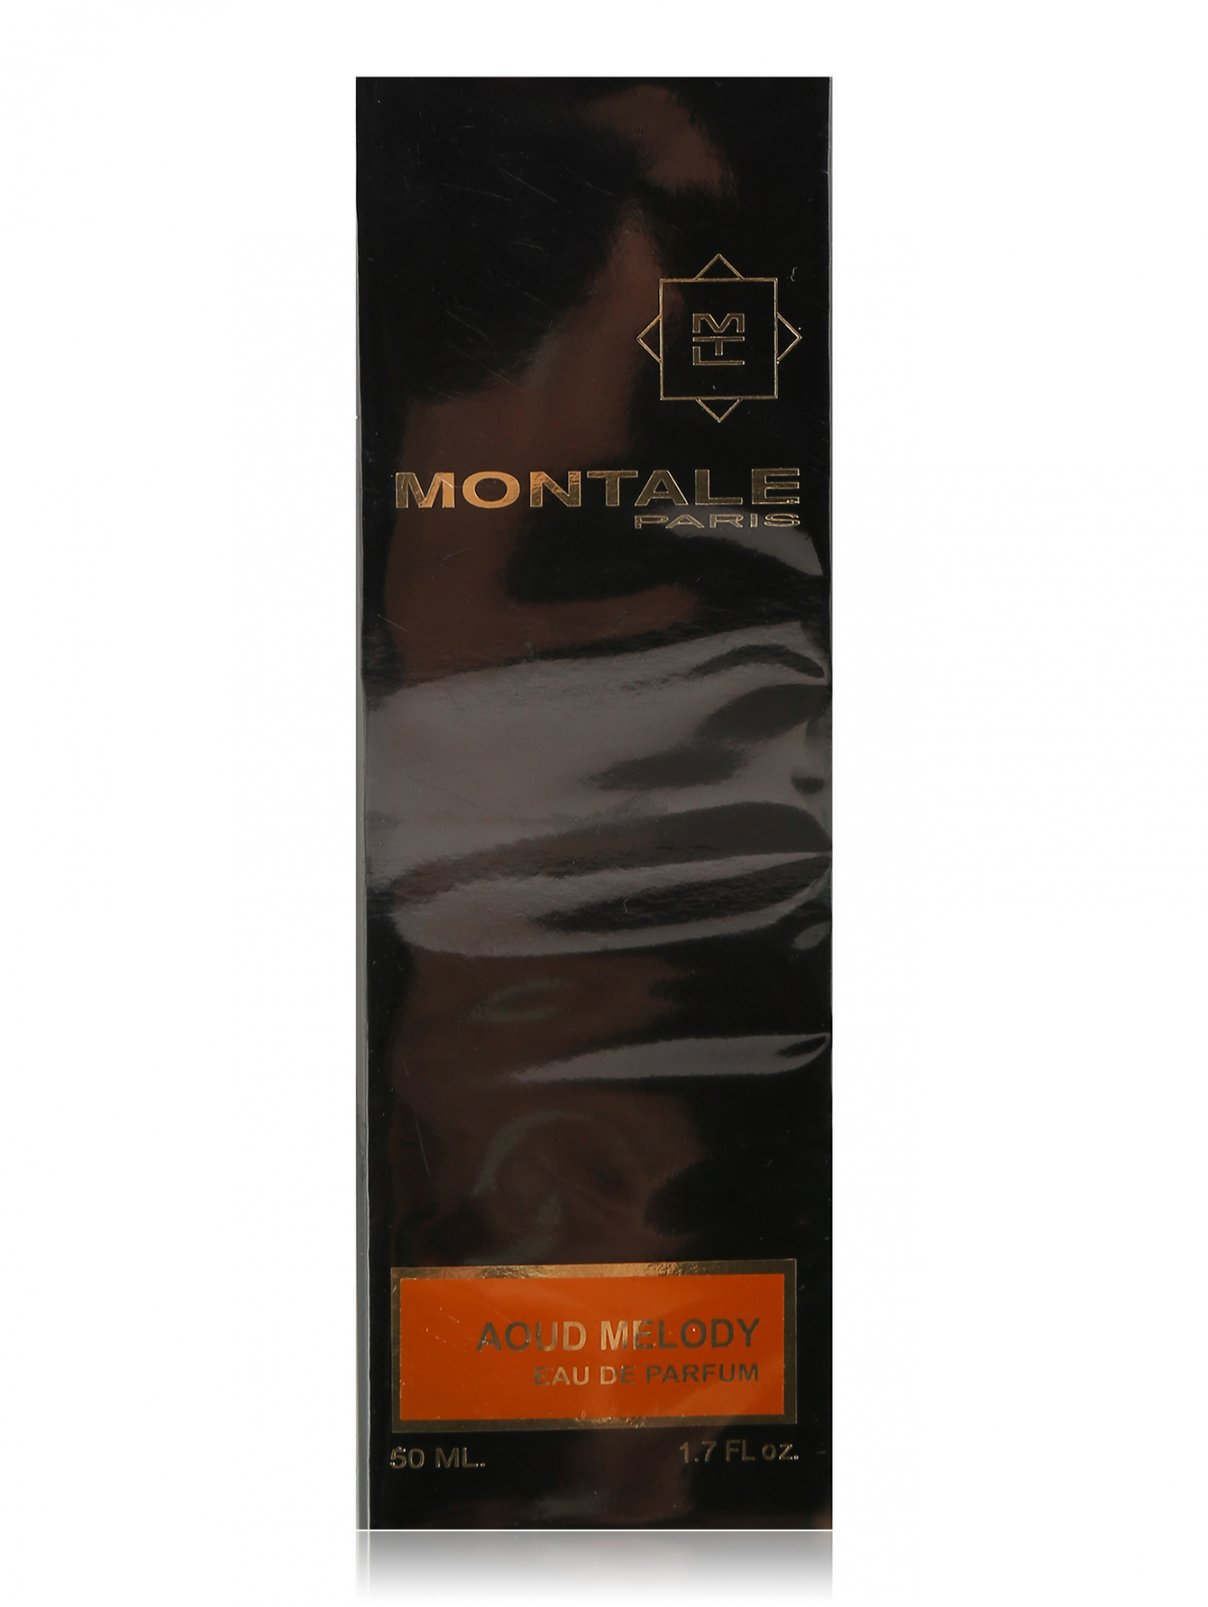 Парфюмерная вода 50 мл Aoud Melody Montale  –  Общий вид